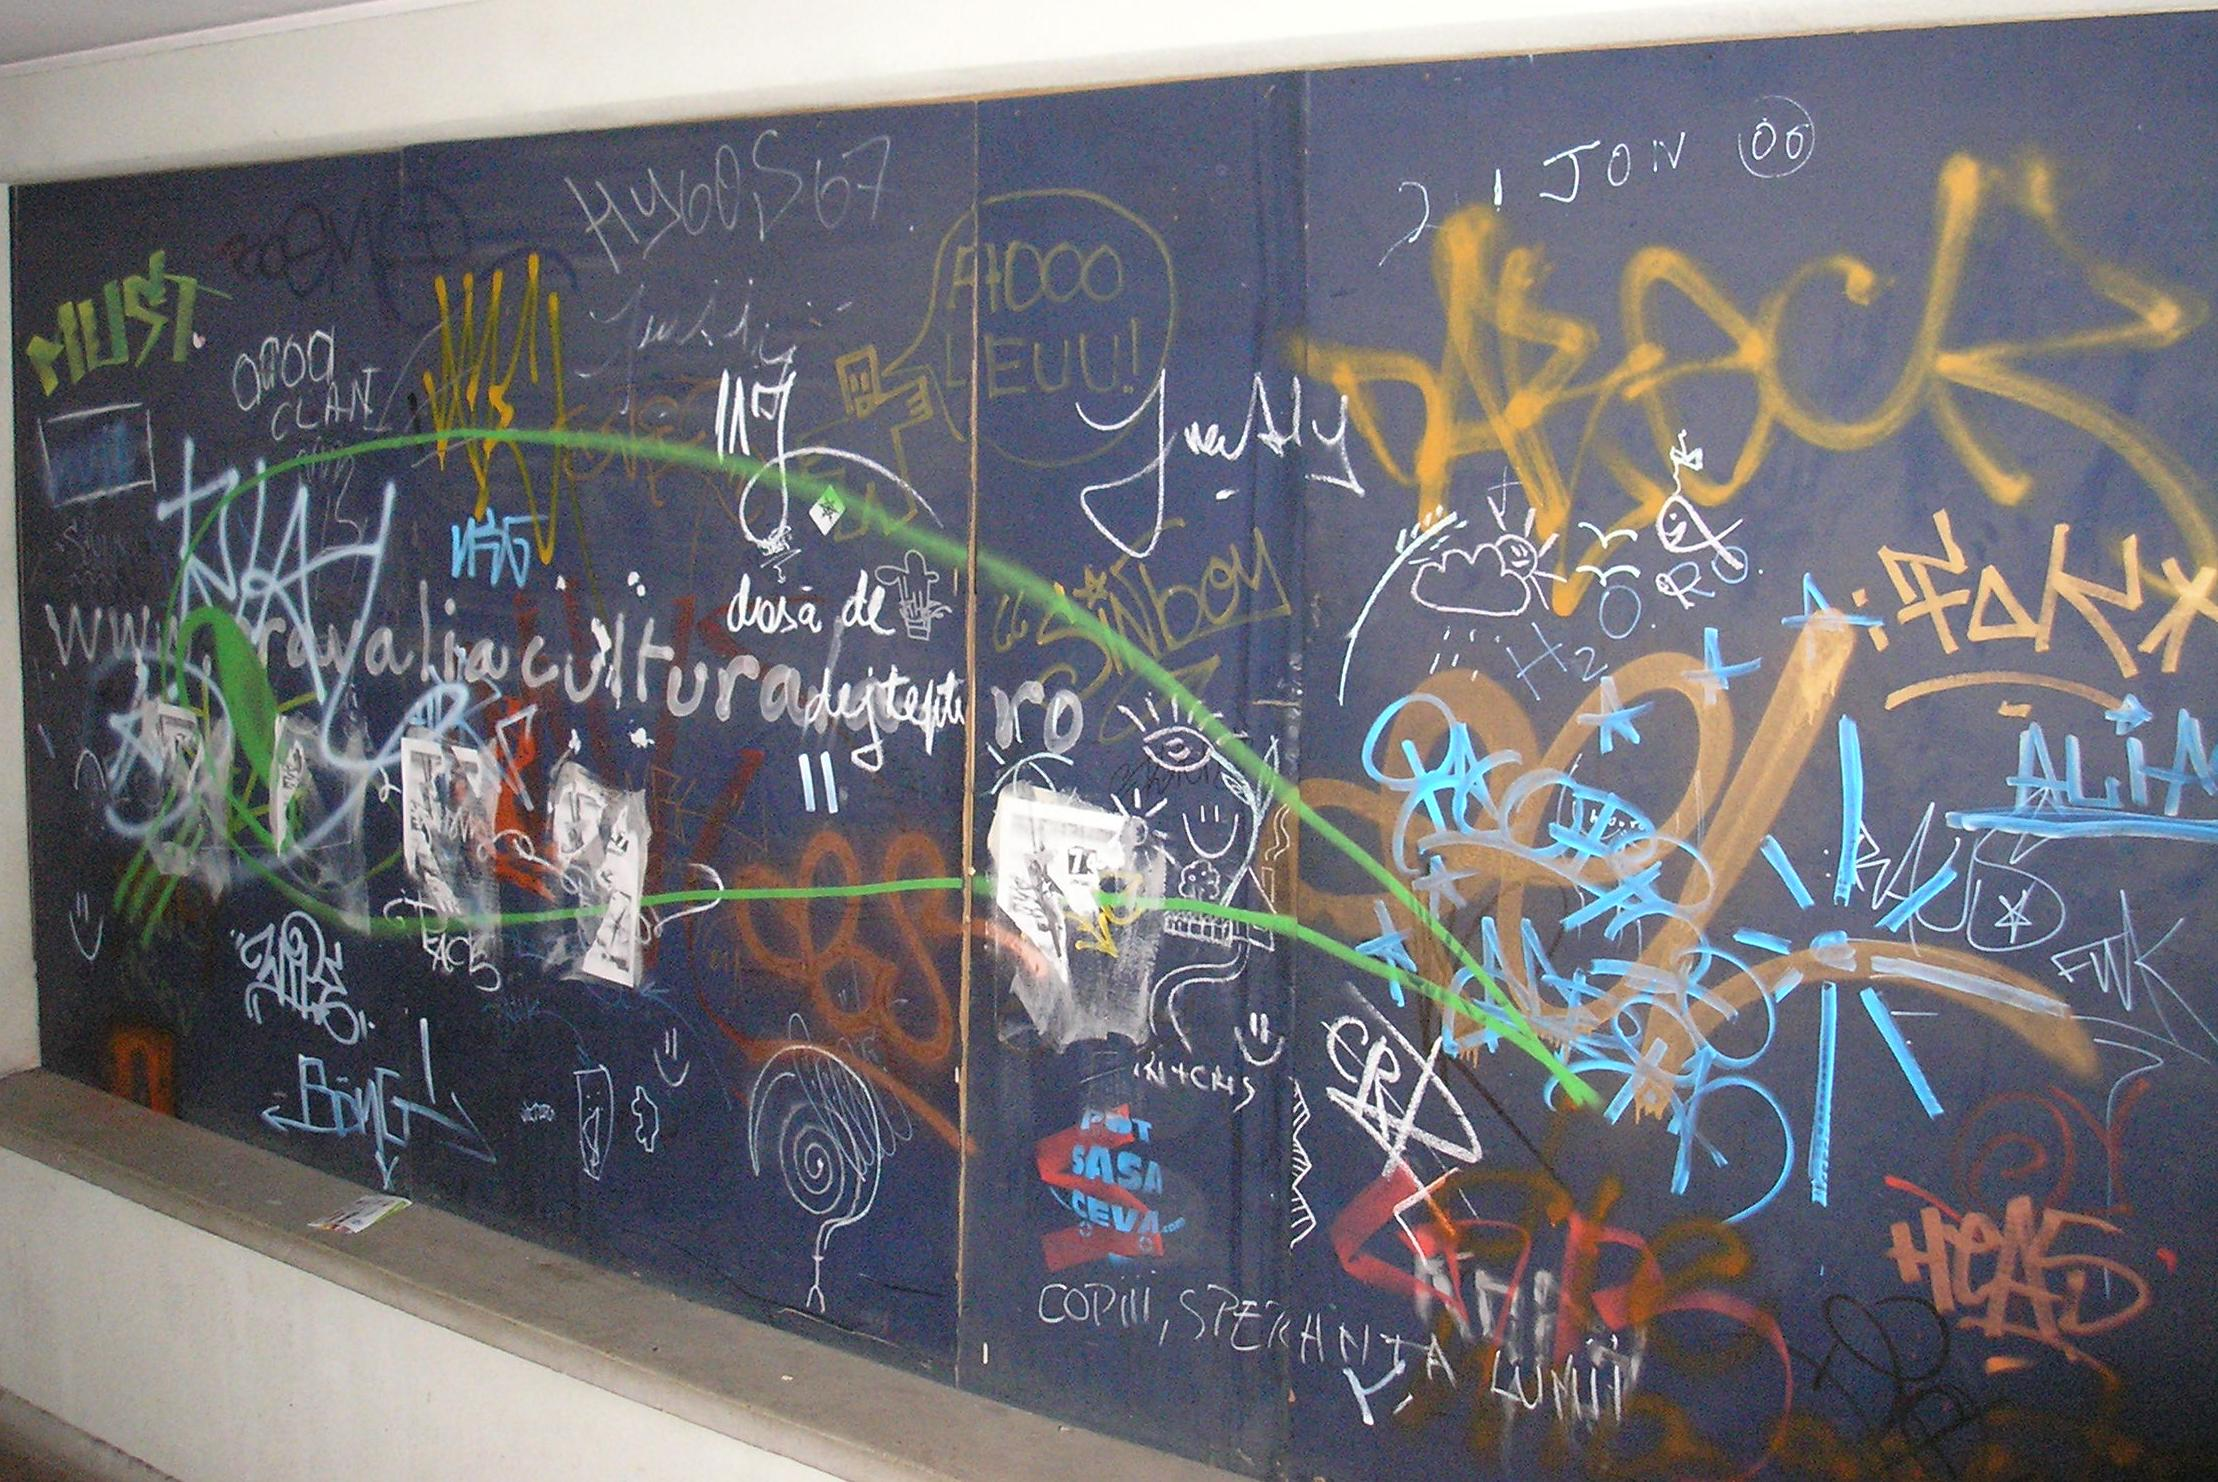 essay about graffiti as vandalism